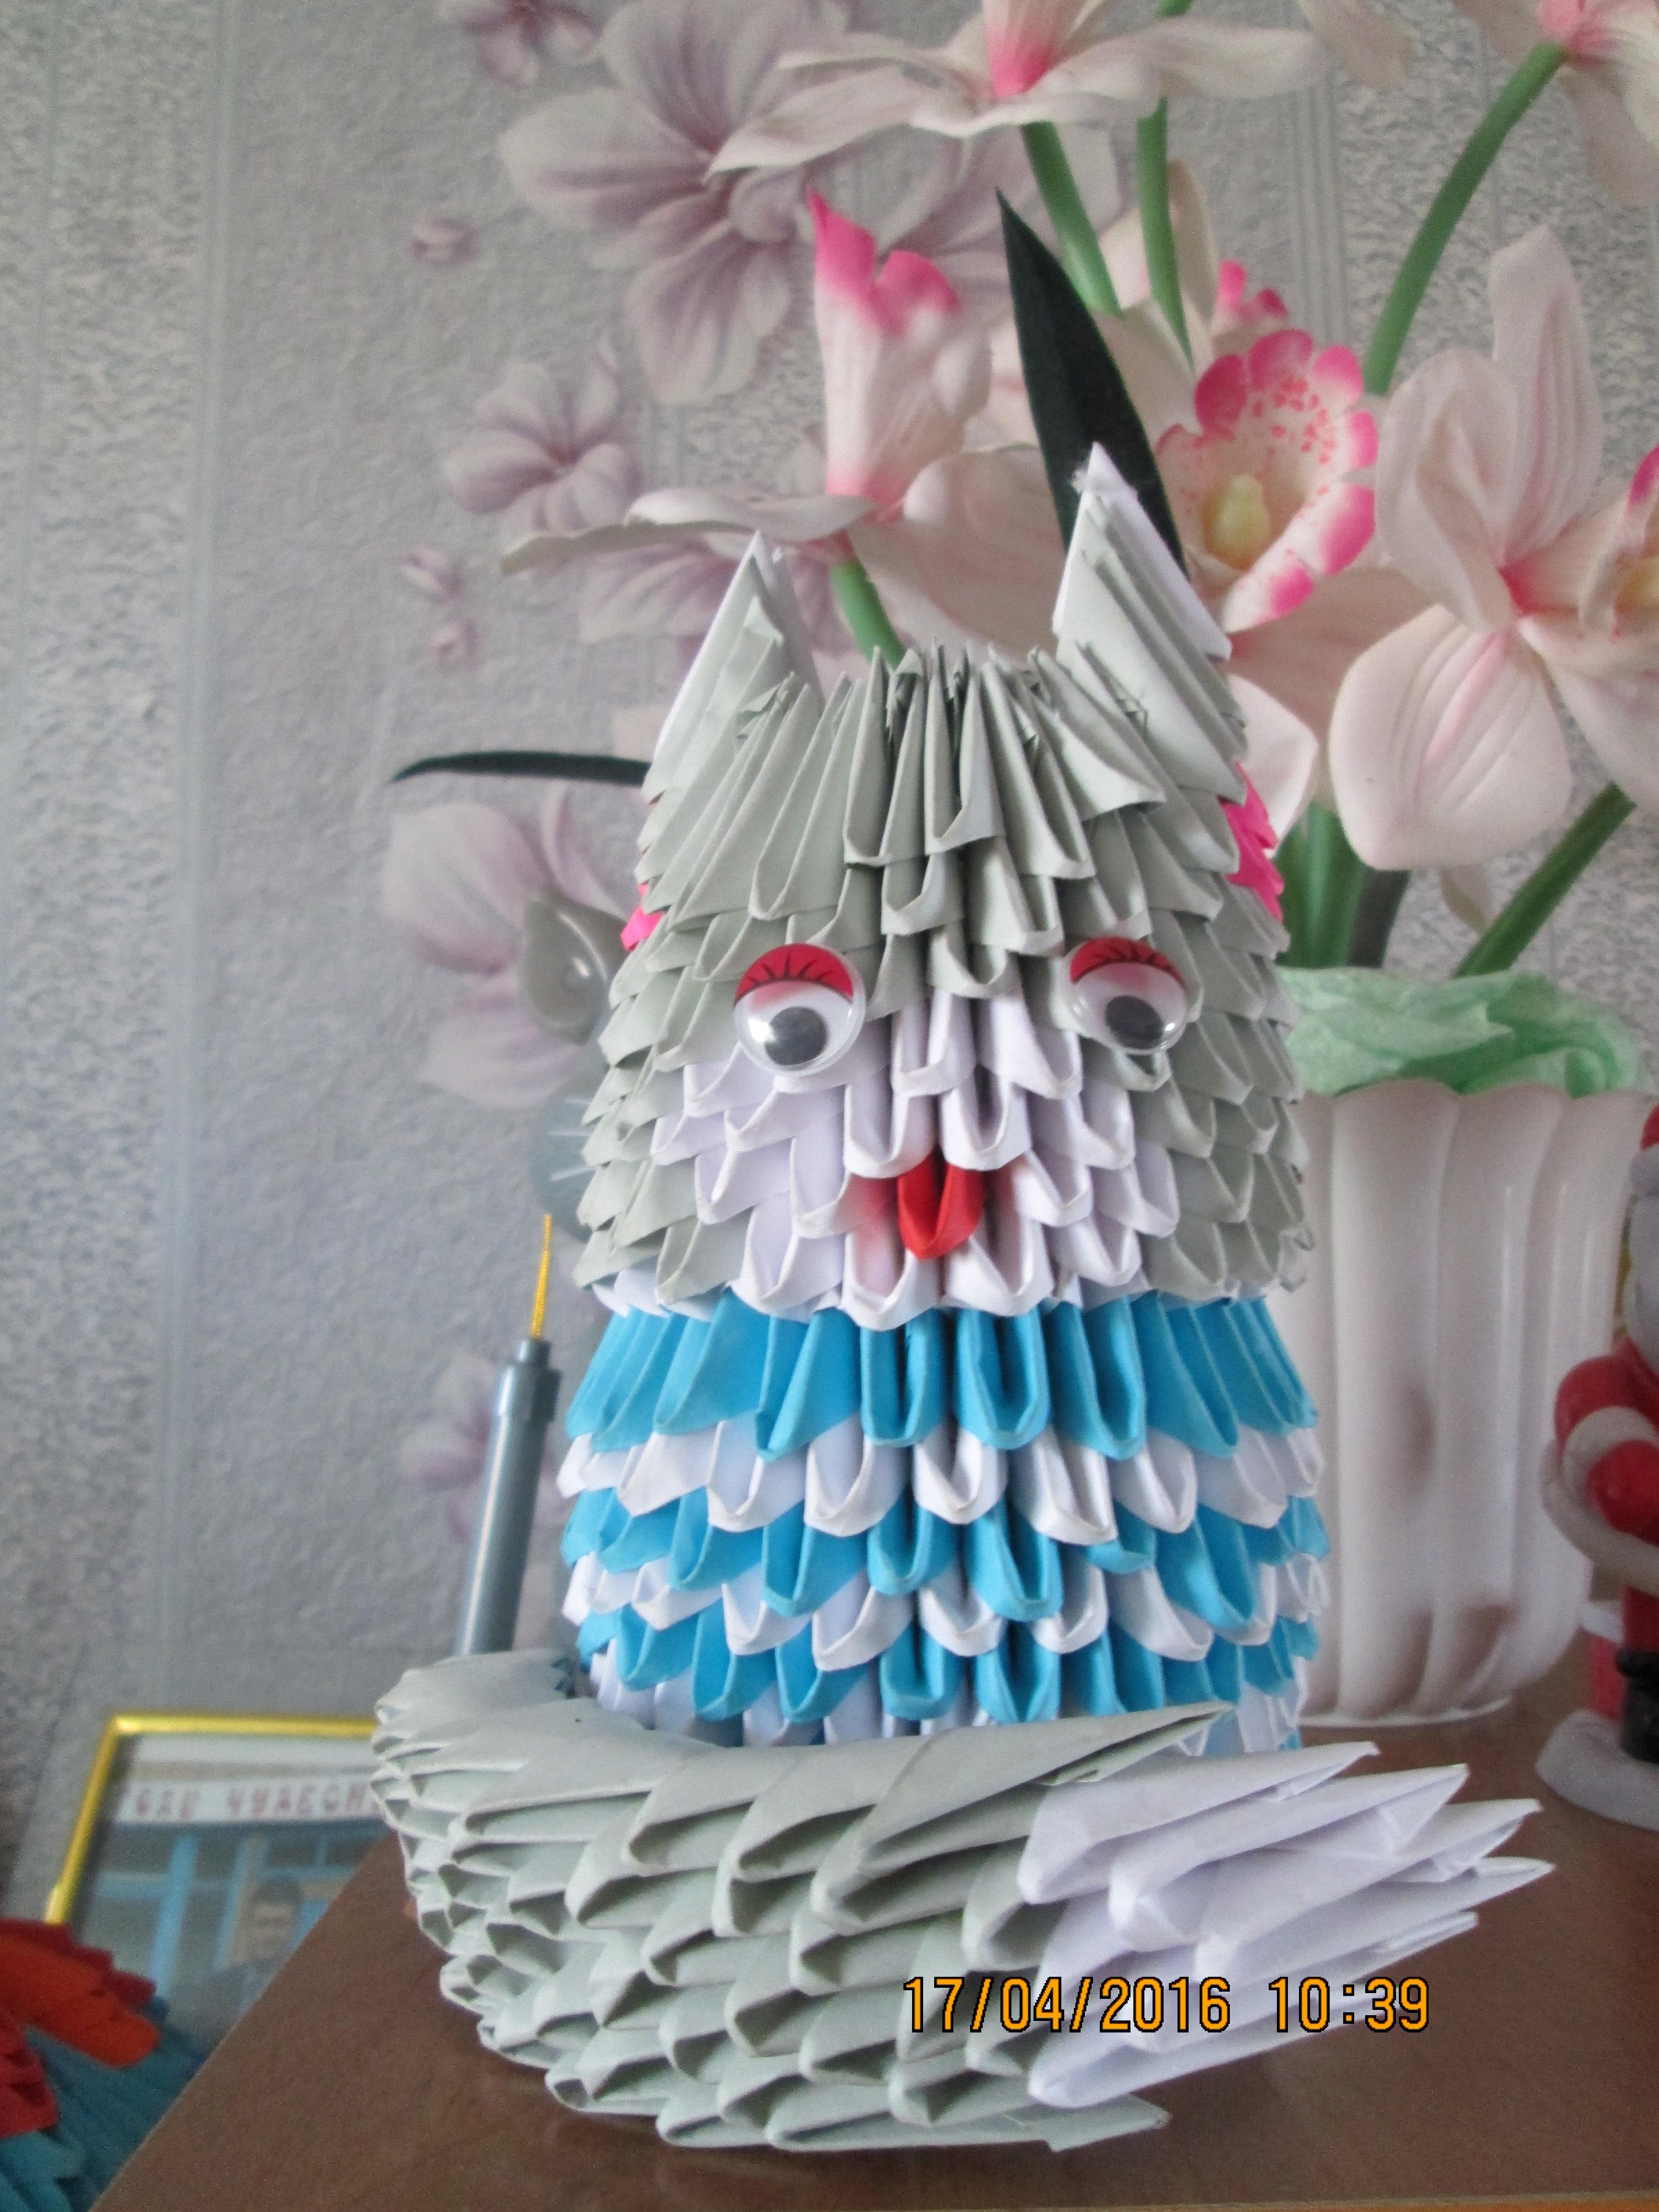 богатеева жар-птица оригами схема